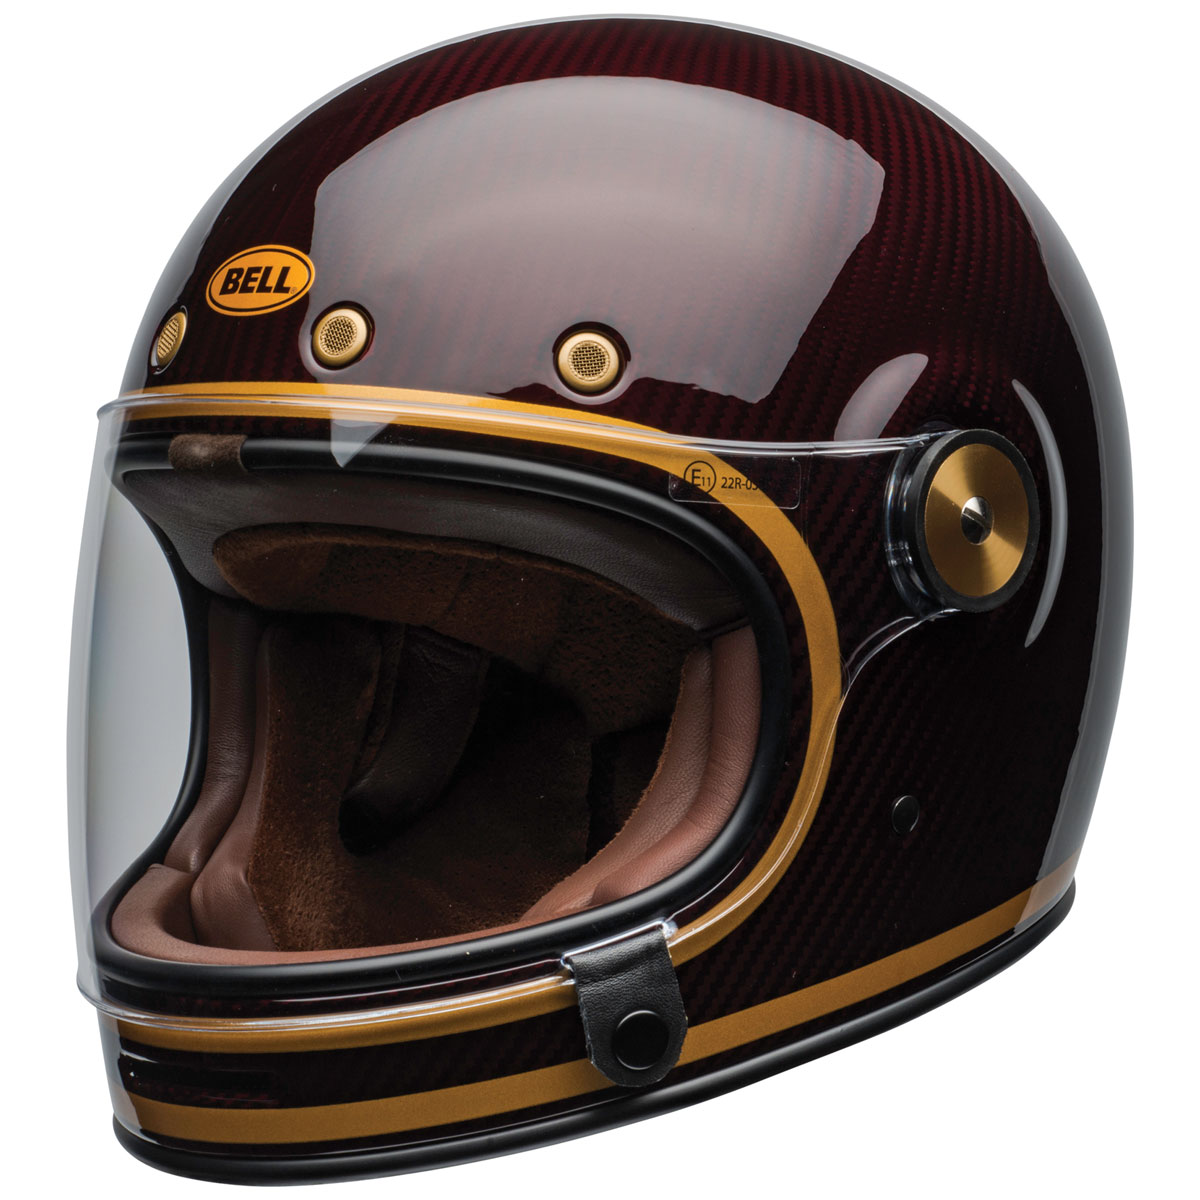 Bell Bullitt Carbon Transend Candy Red/Gold Full Face Helmet